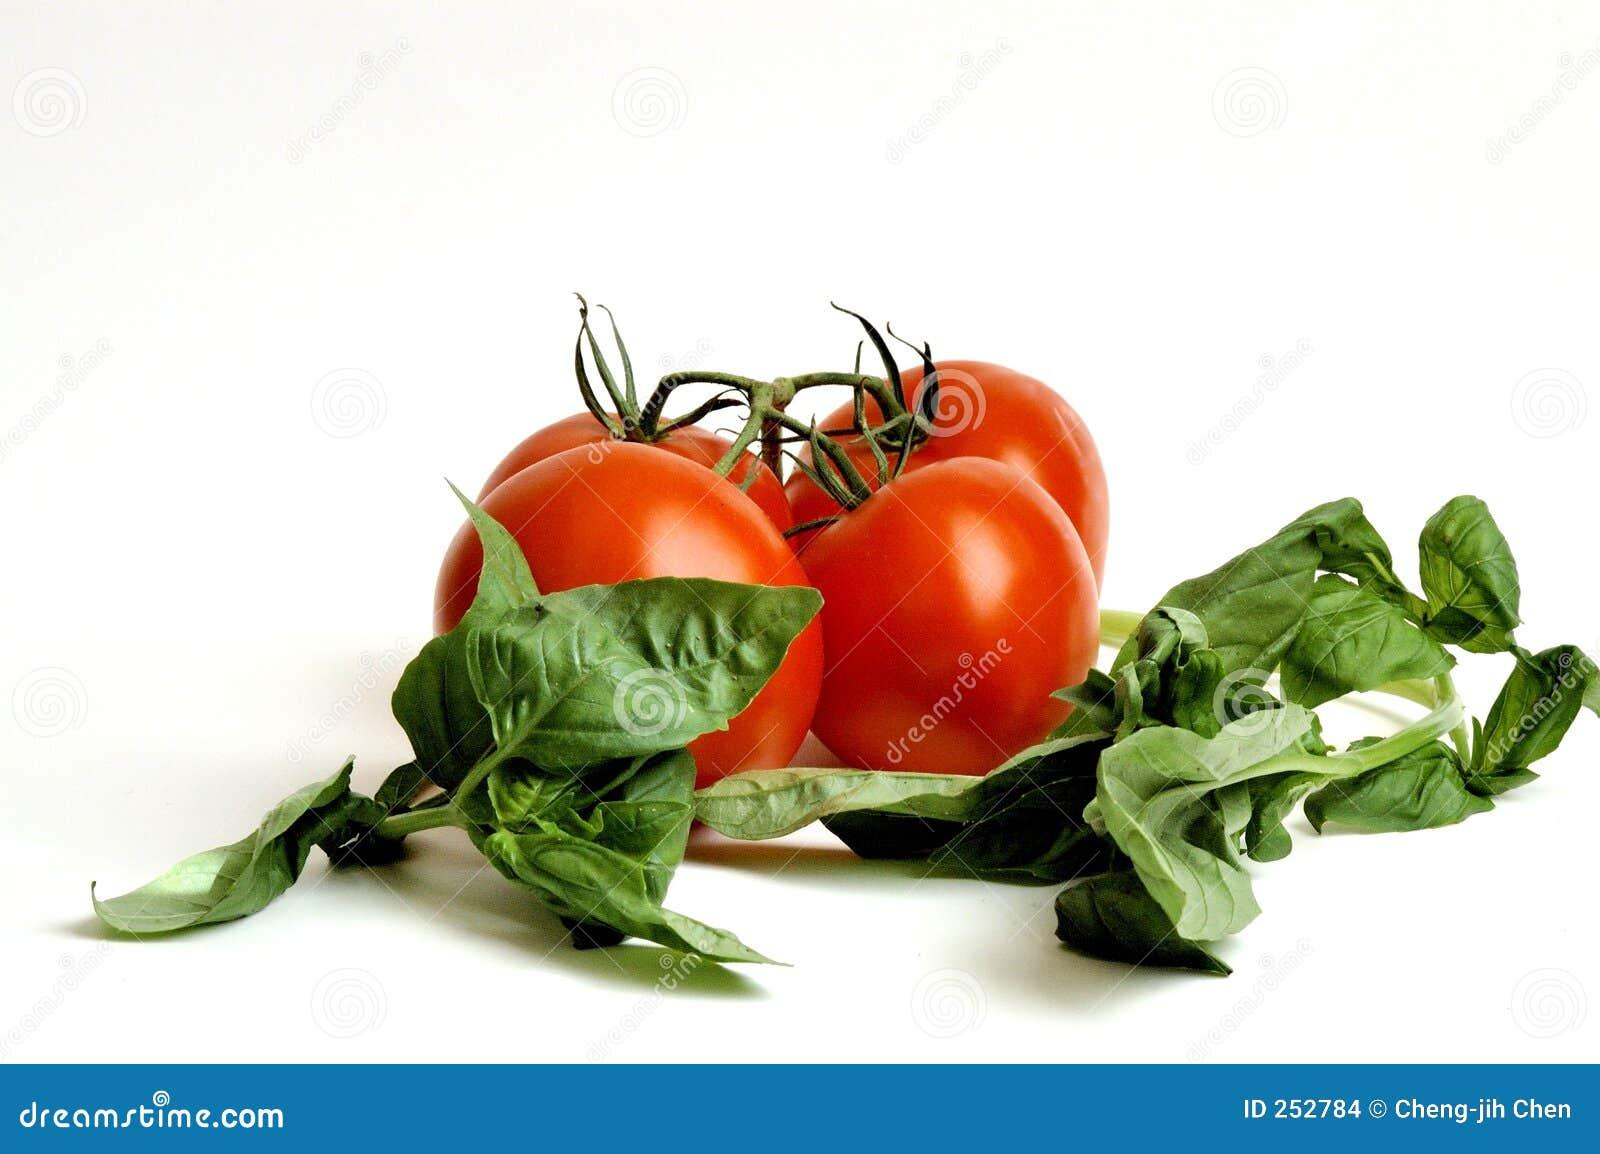 Raw Tomatoes and Basil